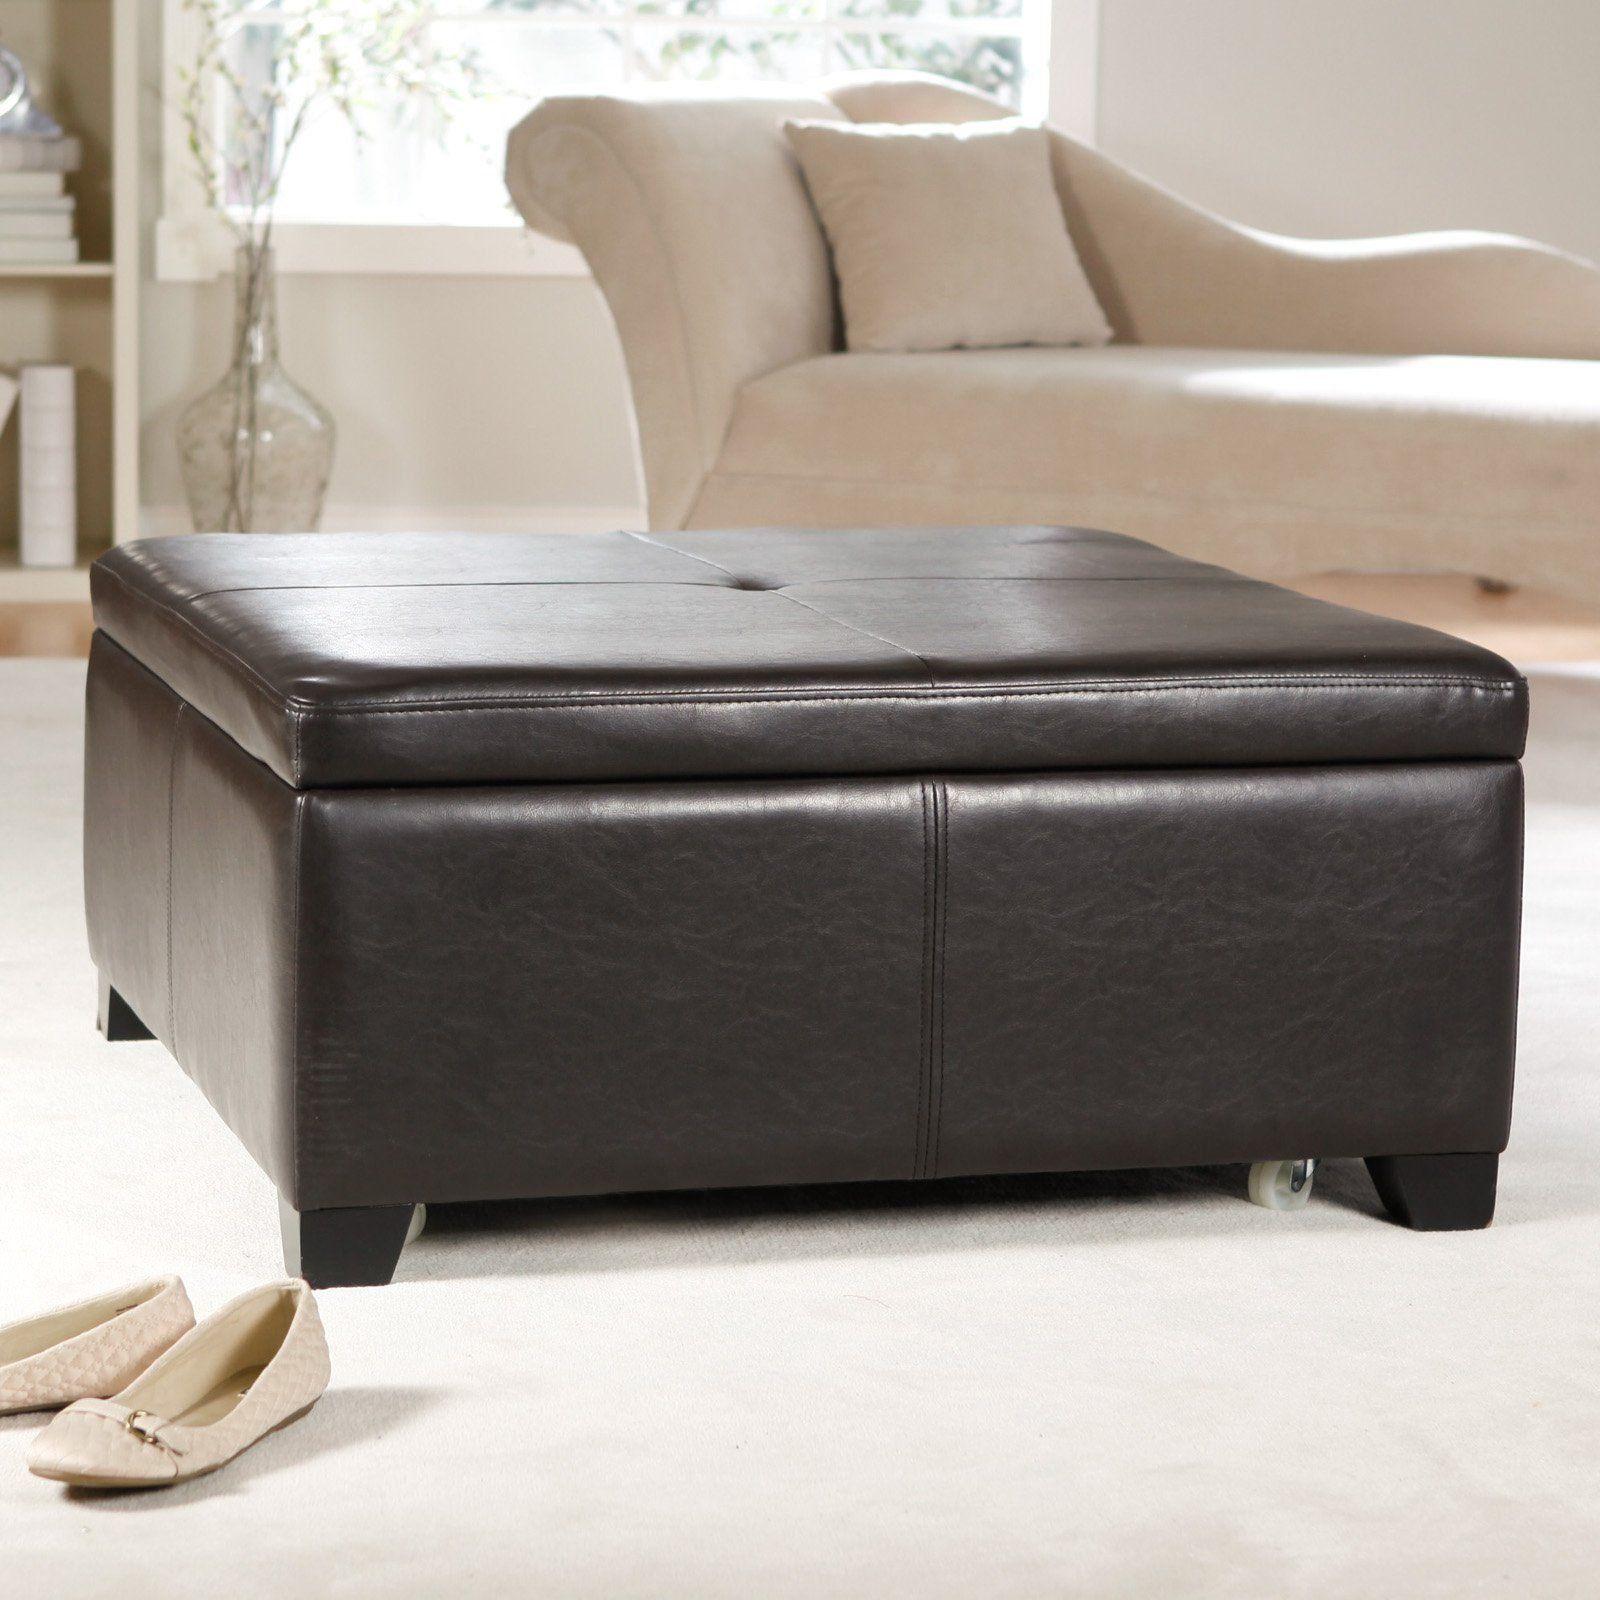 Superb Dvd Storage Leather Coffee Table Storage Ottoman Coffee